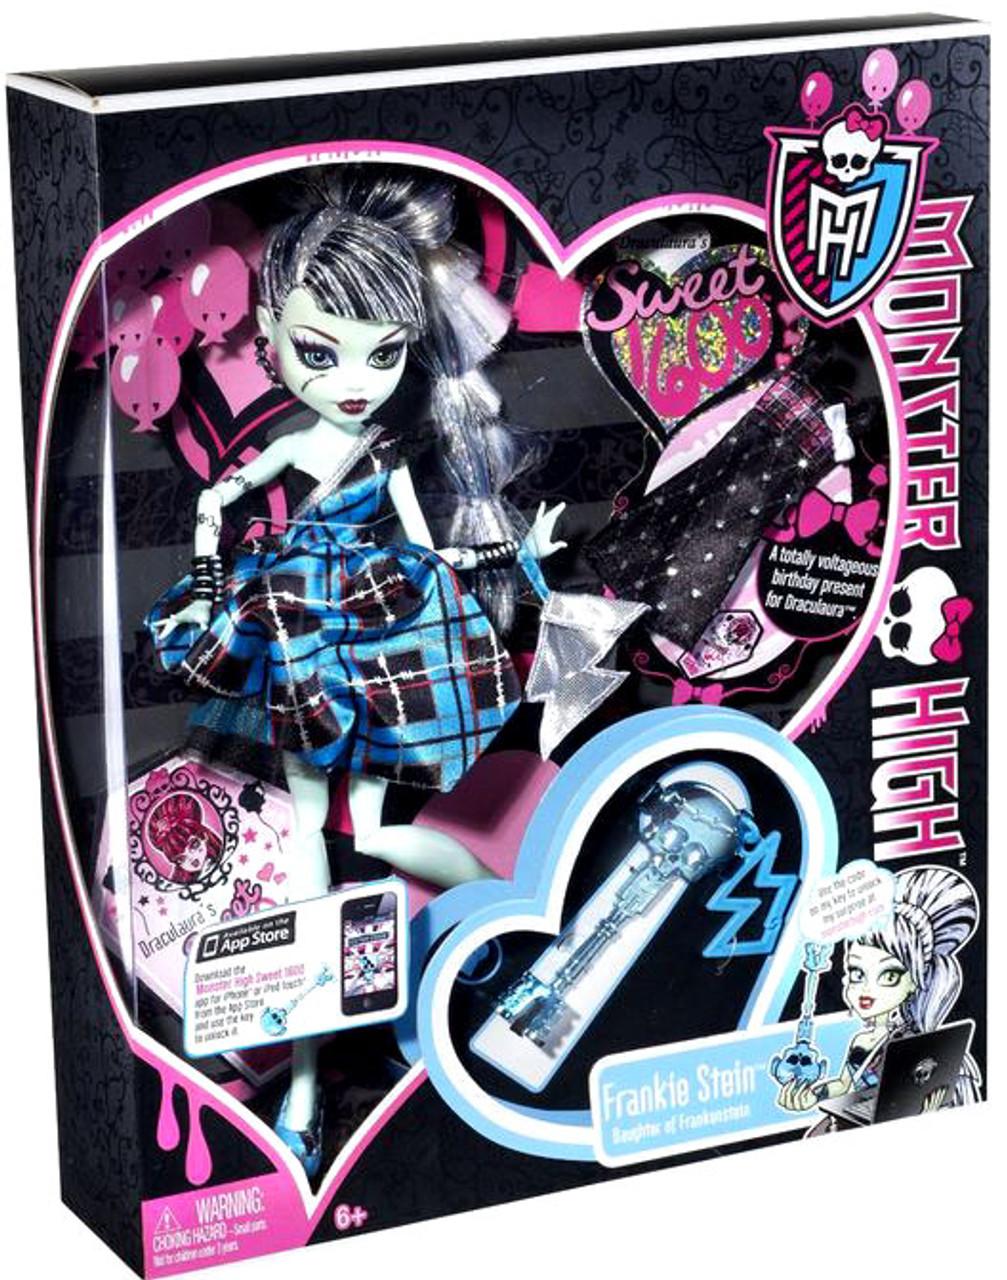 Monster High Sweet 1600 Frankie Stein 10.5-Inch Doll